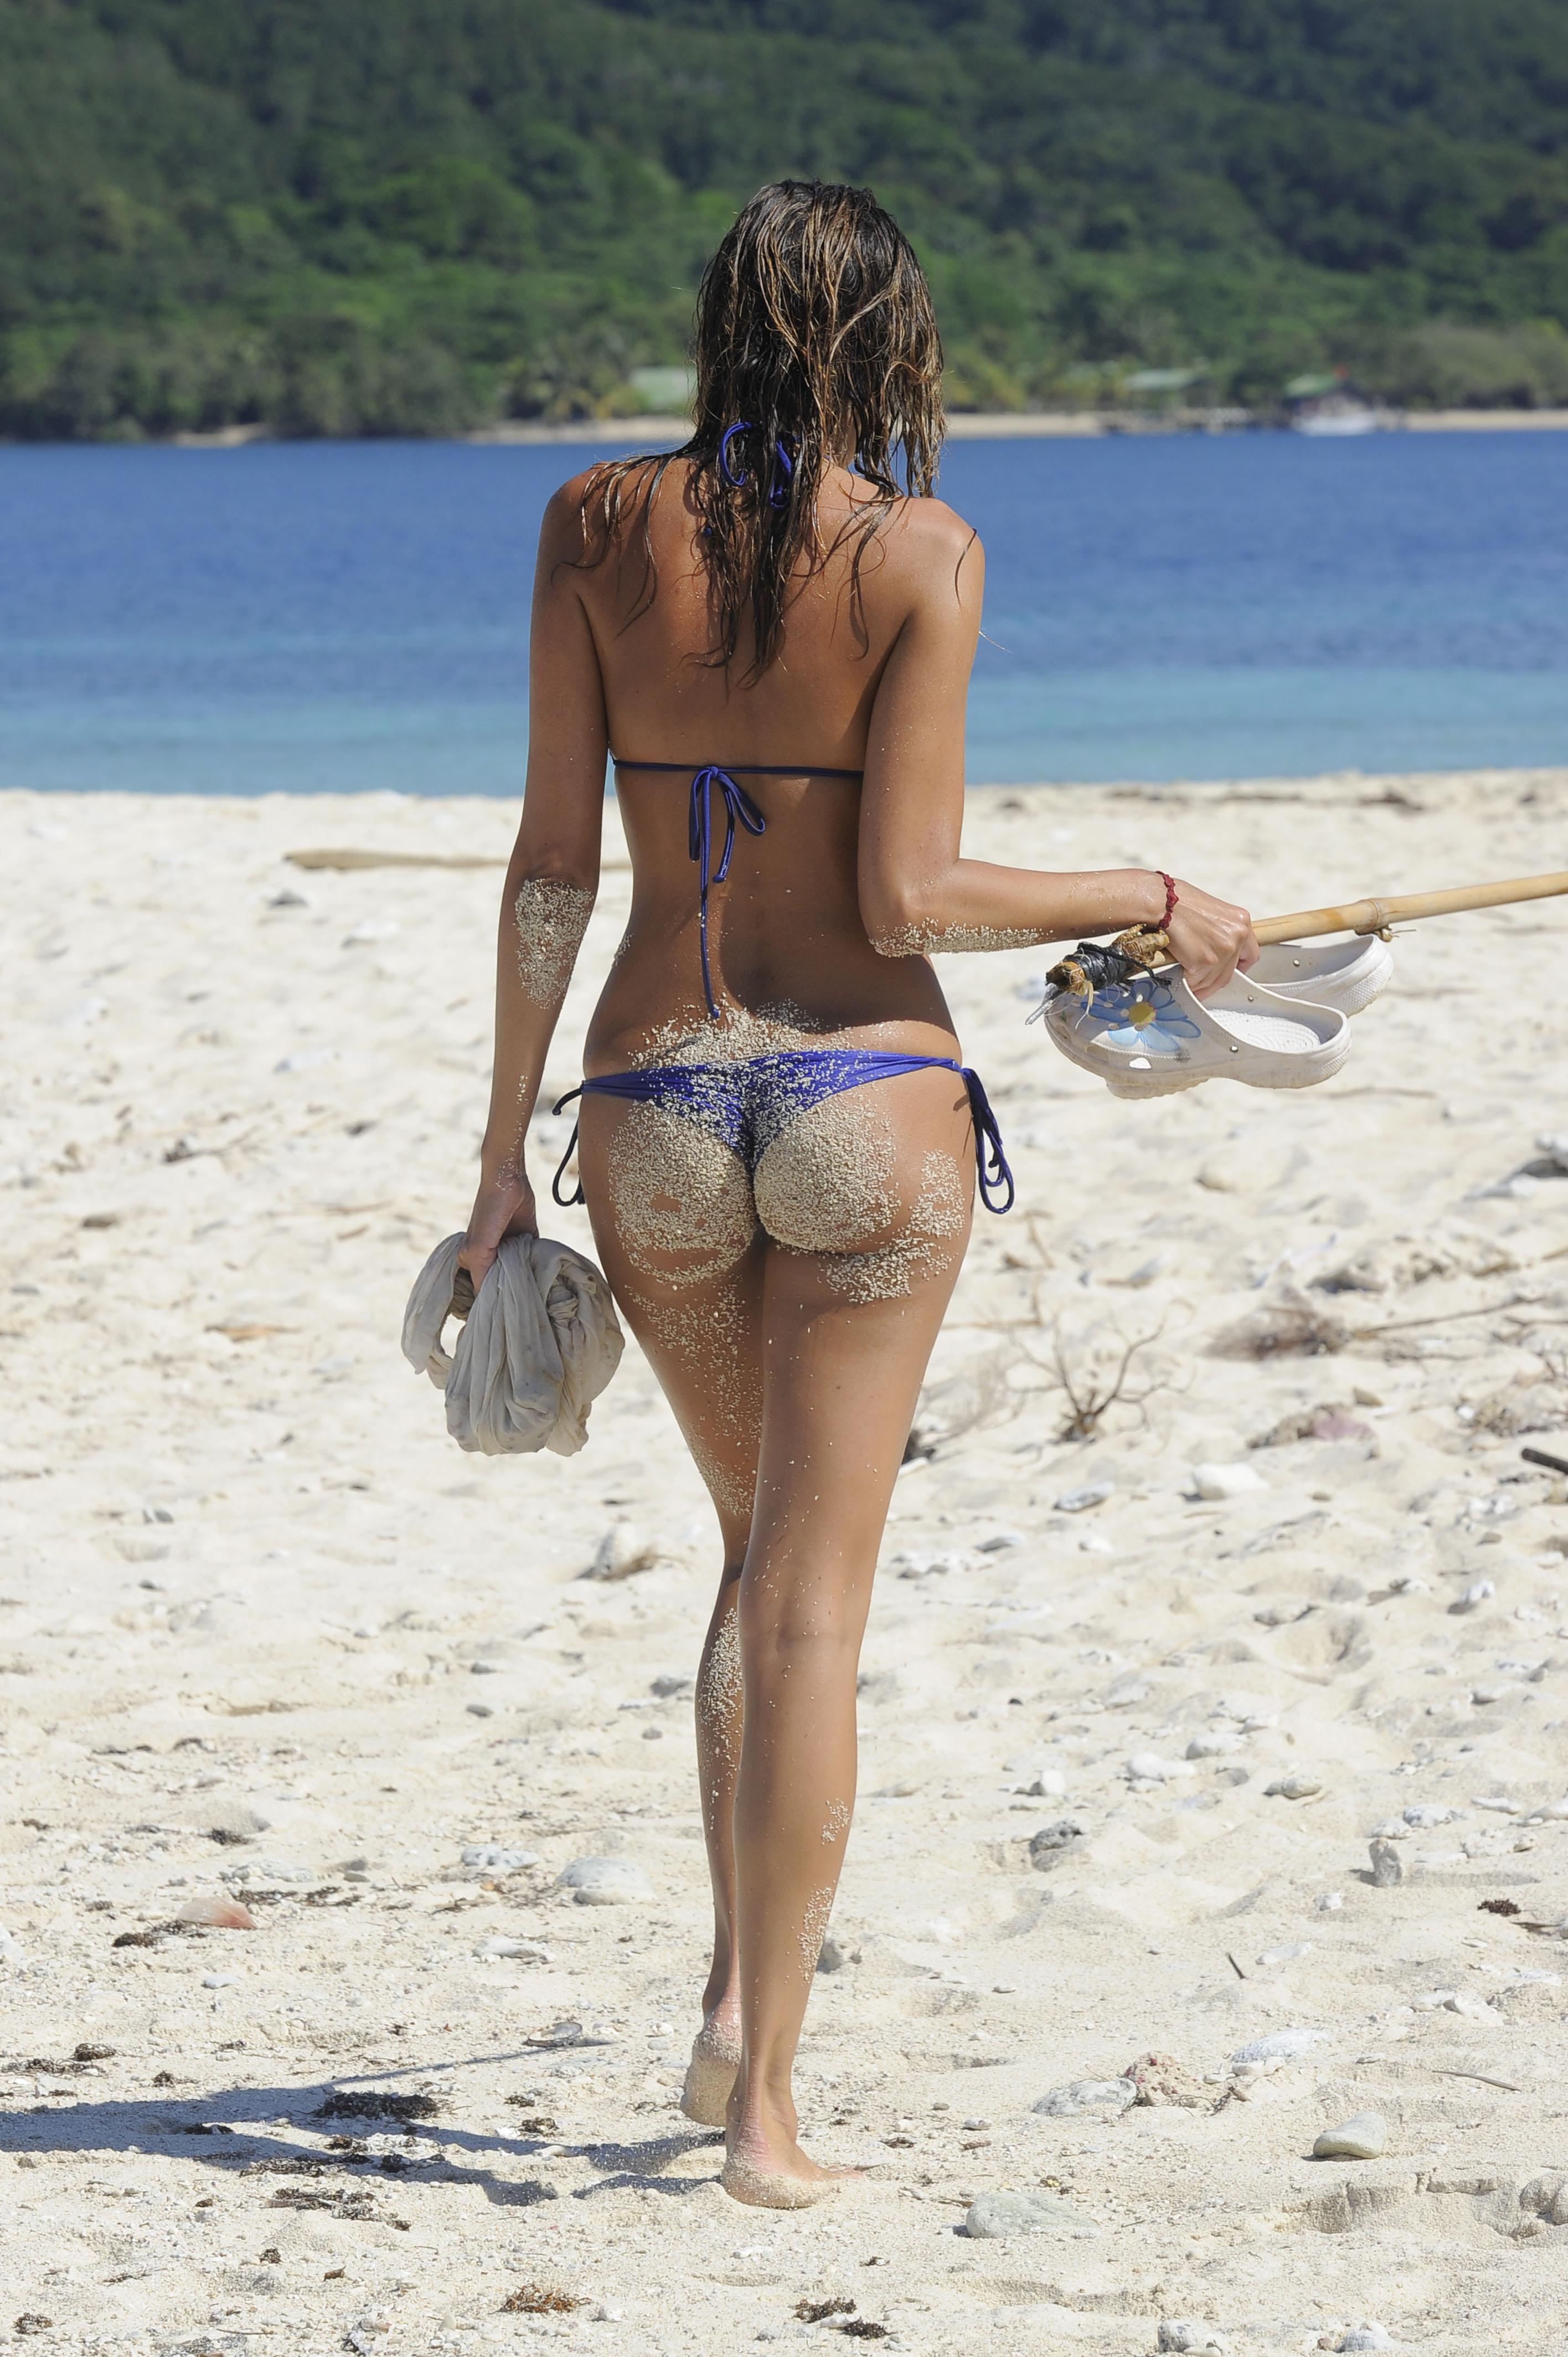 Фото вид сзади на пляже 7 фотография